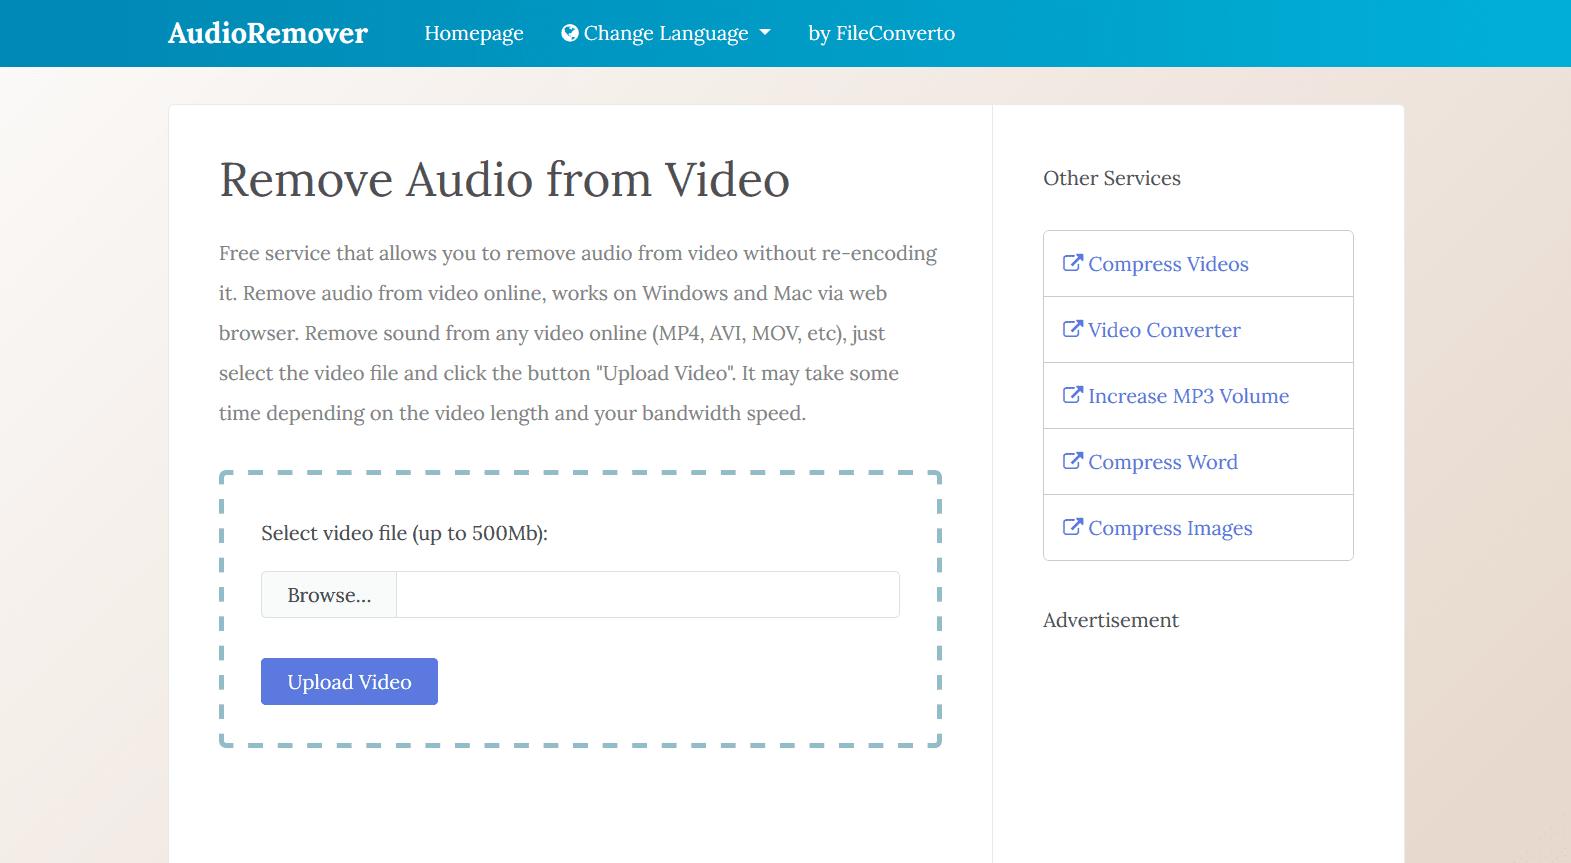 www.audioremover.com